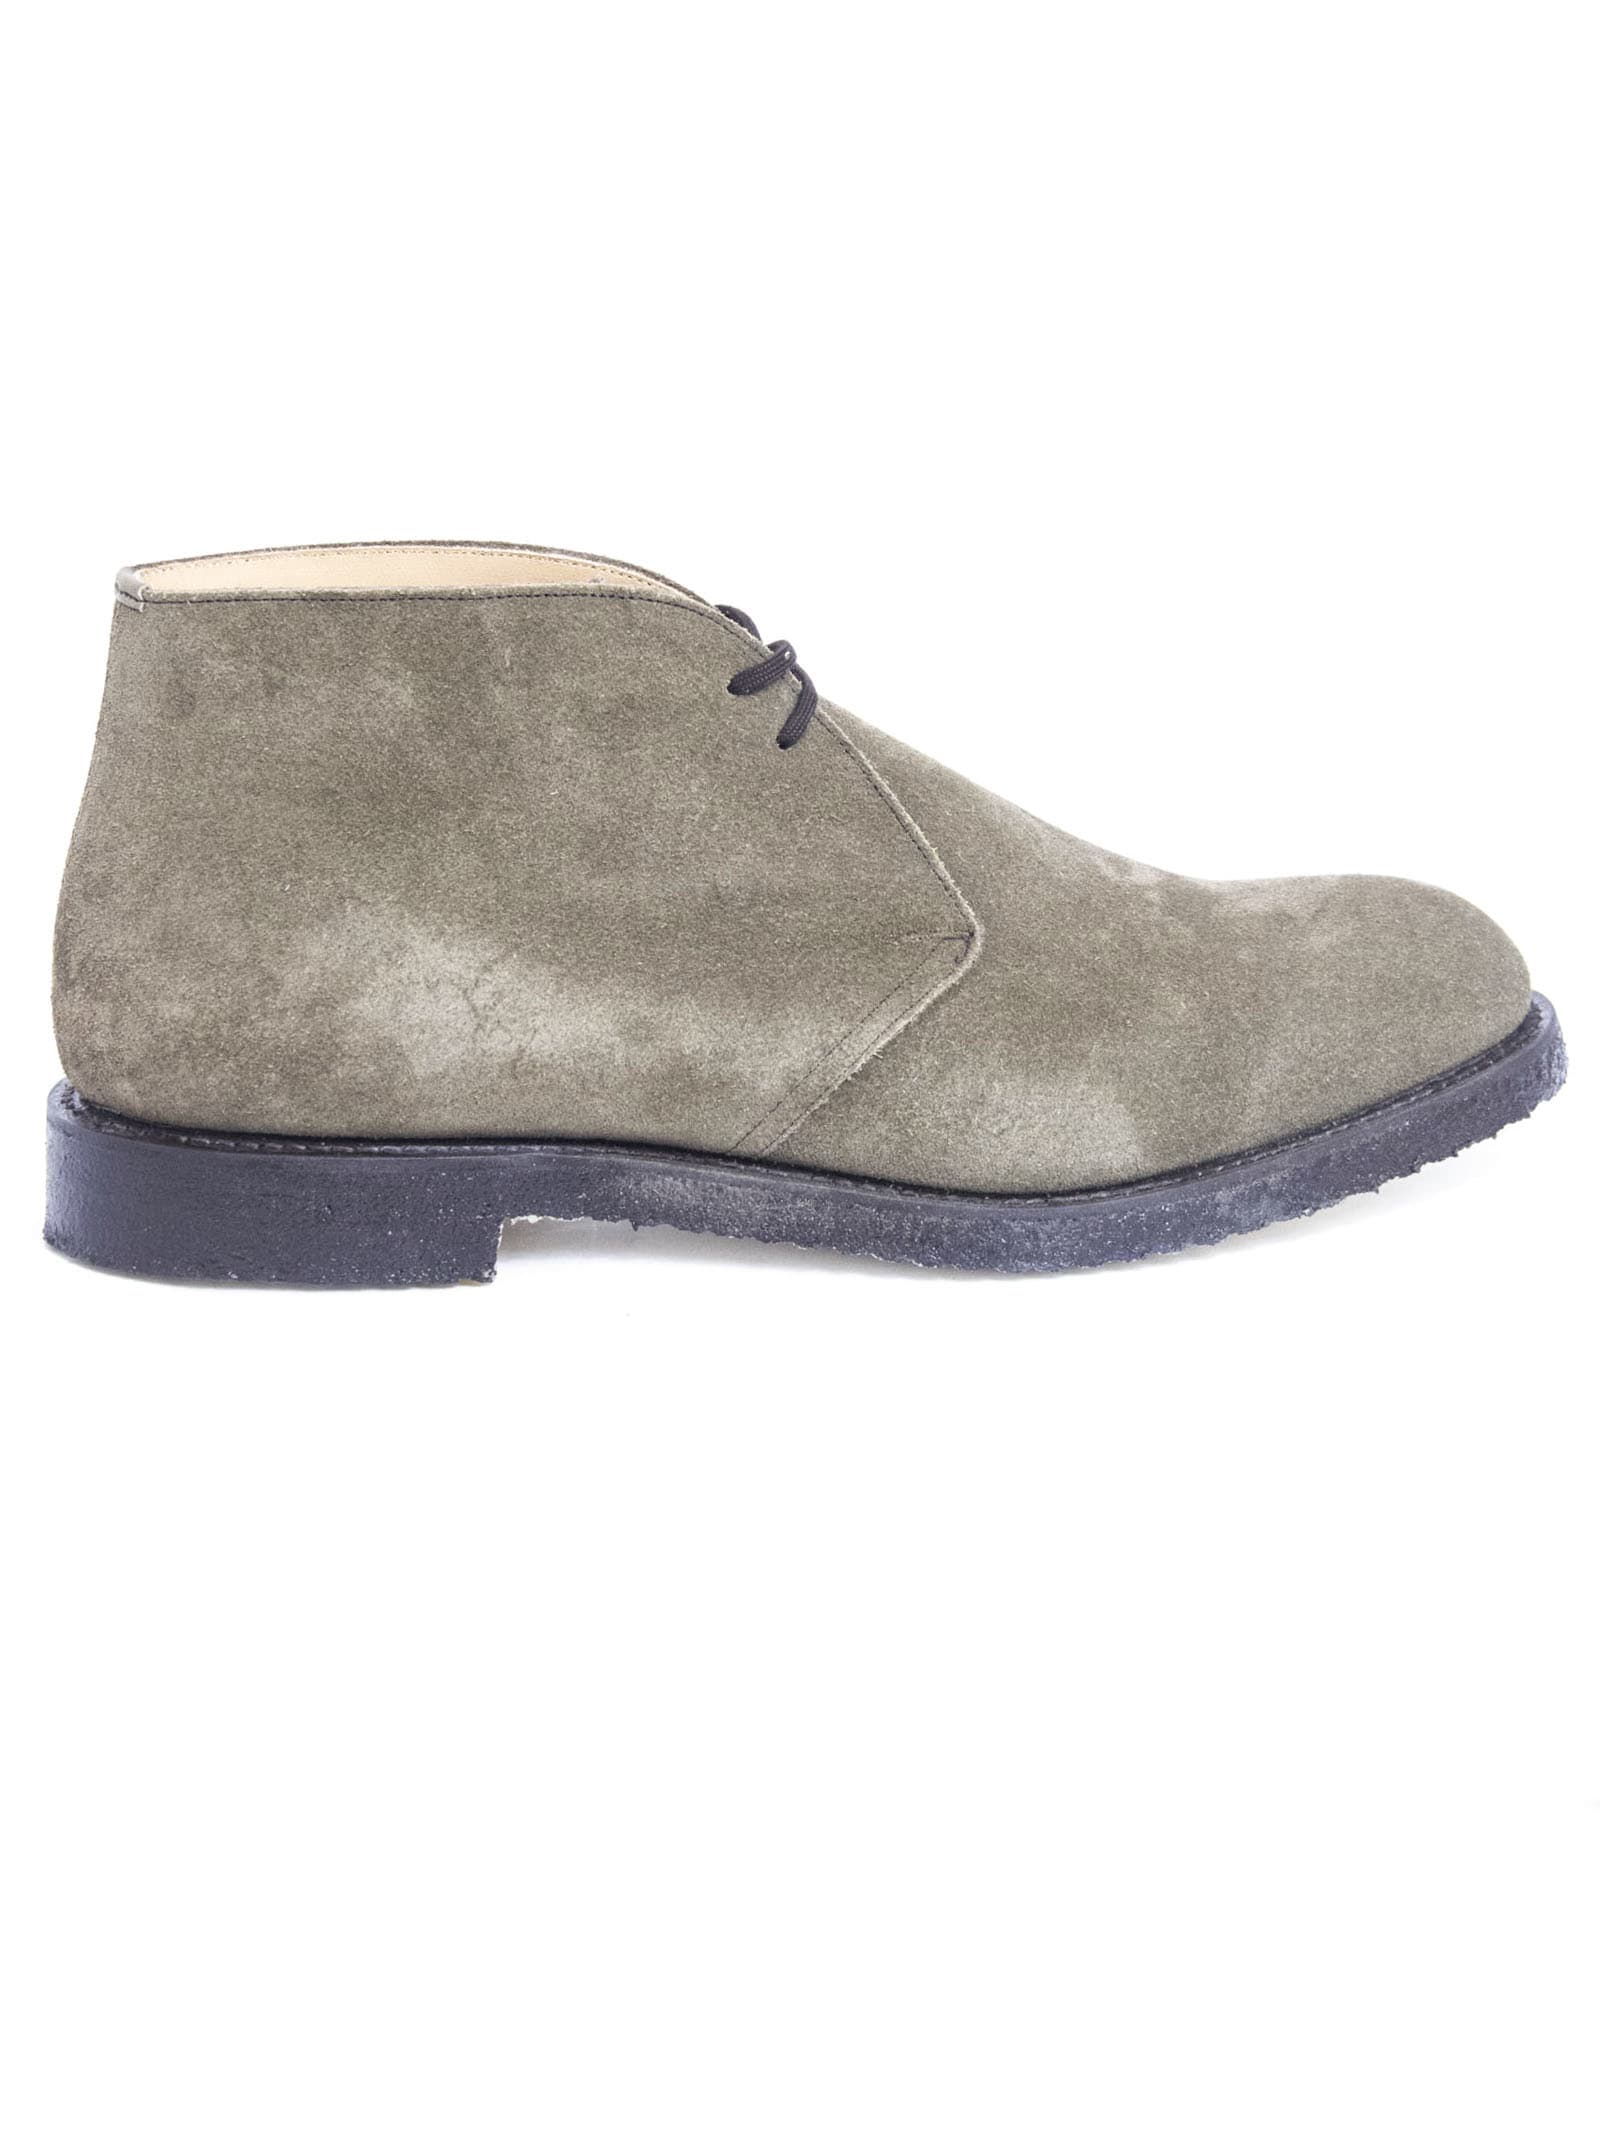 Churchs Ryder 81 Grey Suede Desert Boot